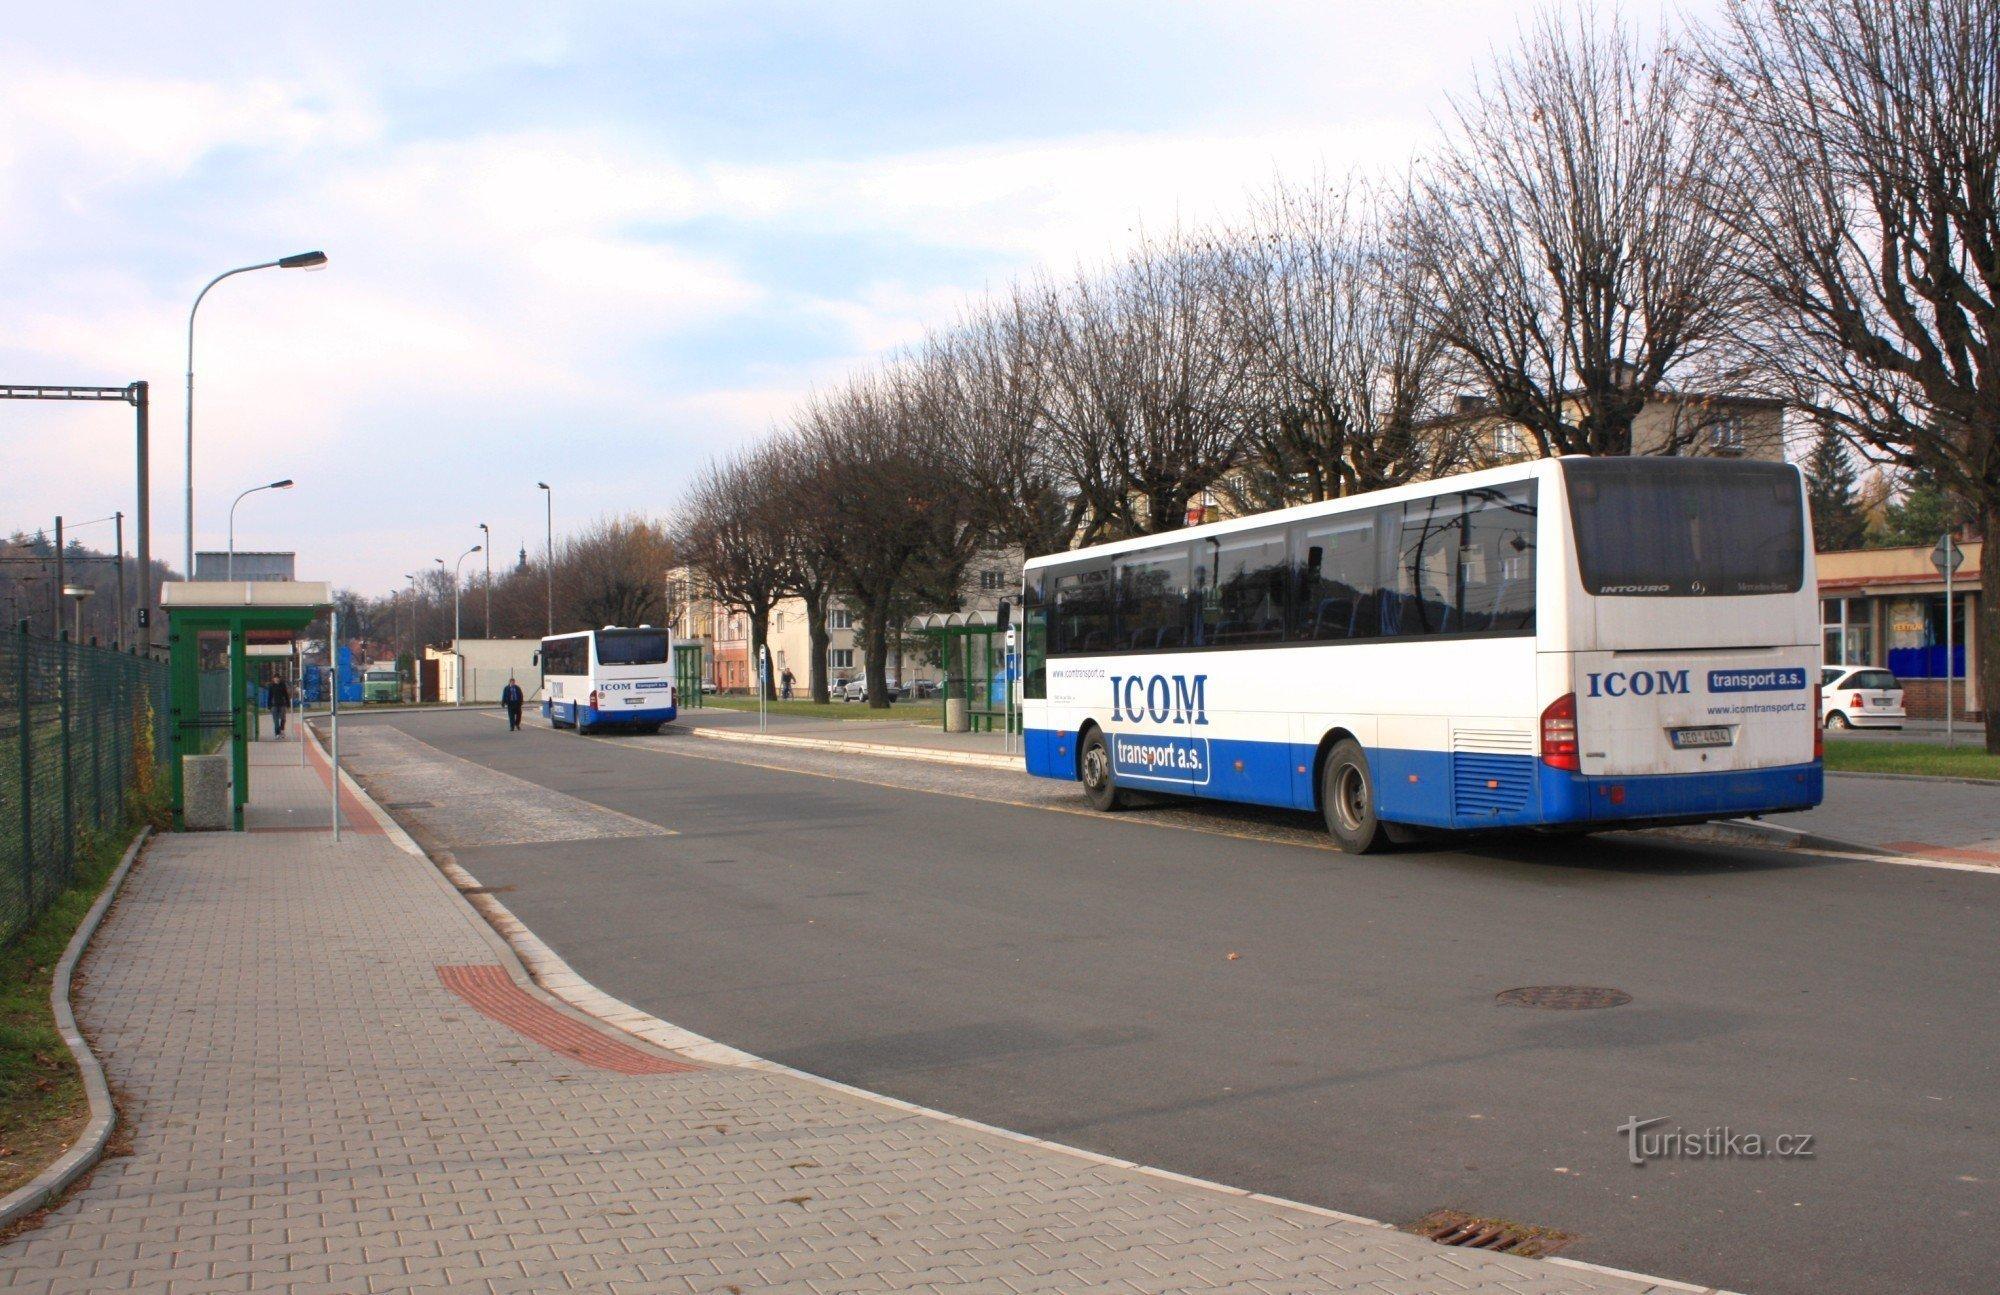 Autobus orgie